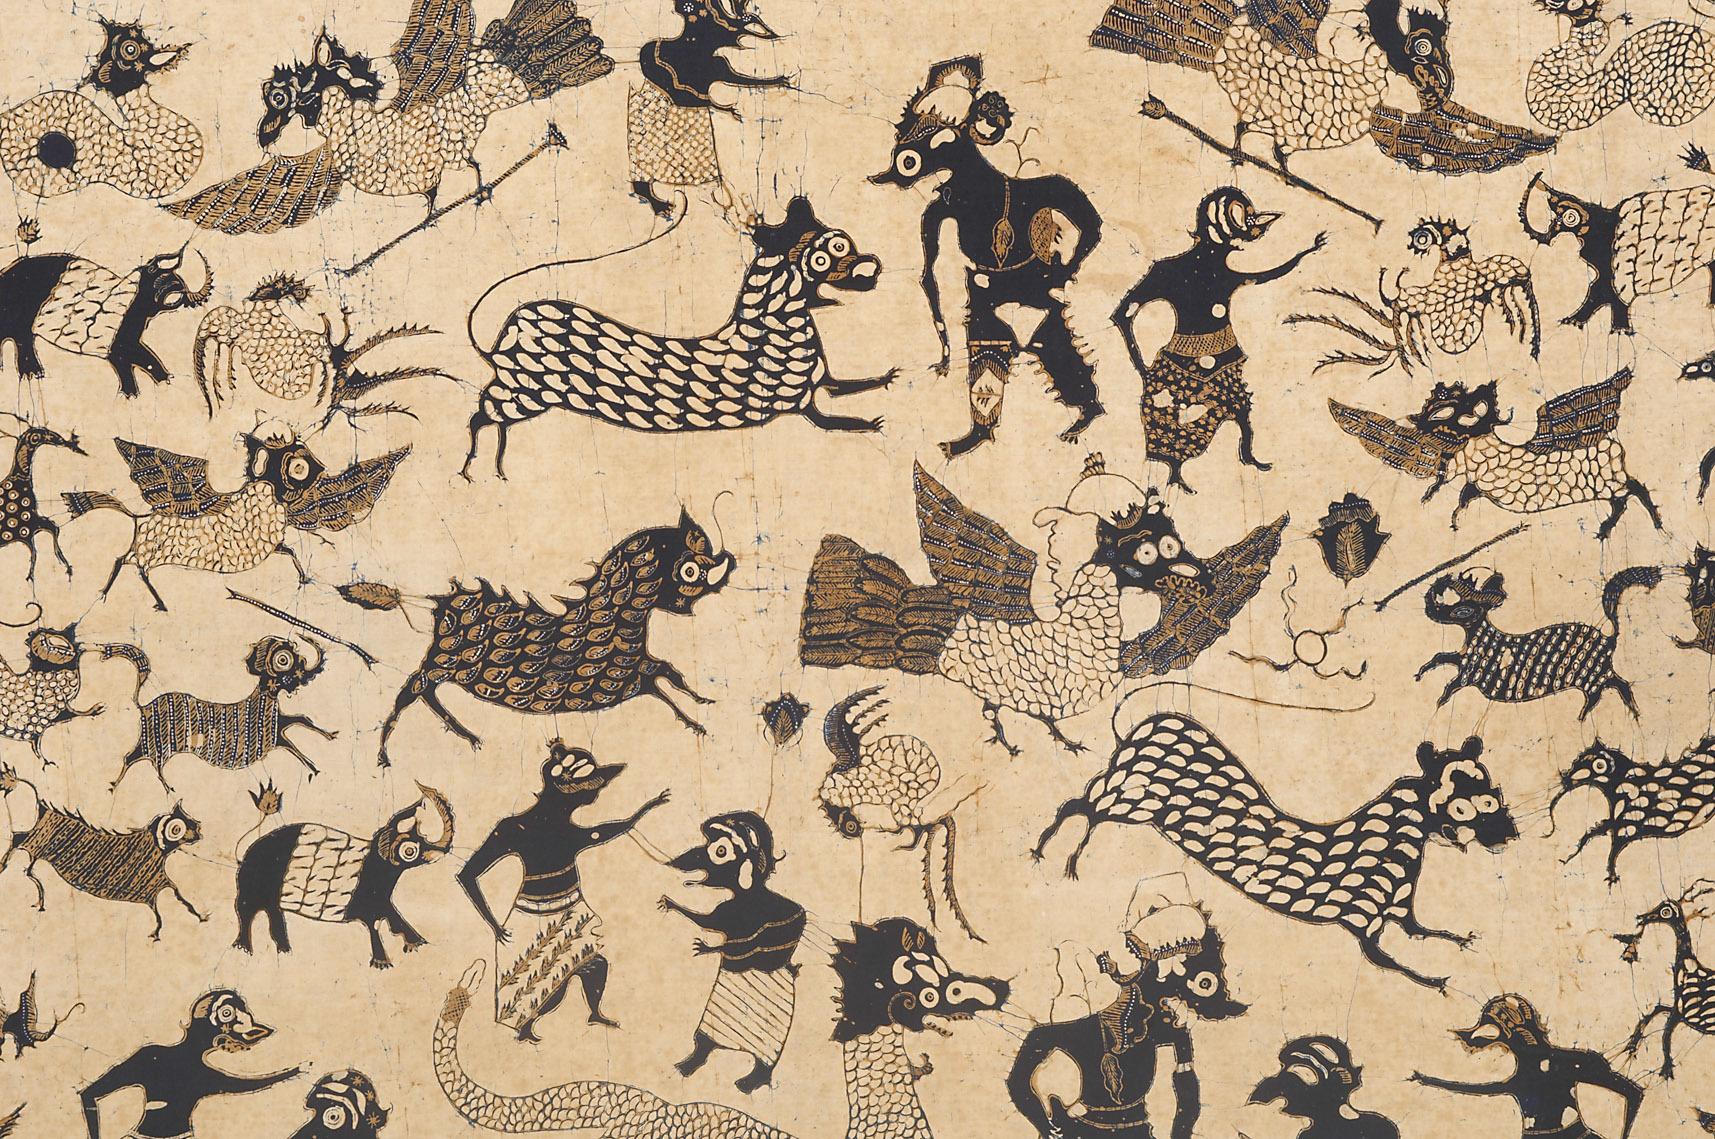 Detail of Batik Cloth |  Kain Panjang  | Cirebon, Java | Mid 19th Century © KHM-Museumsverband